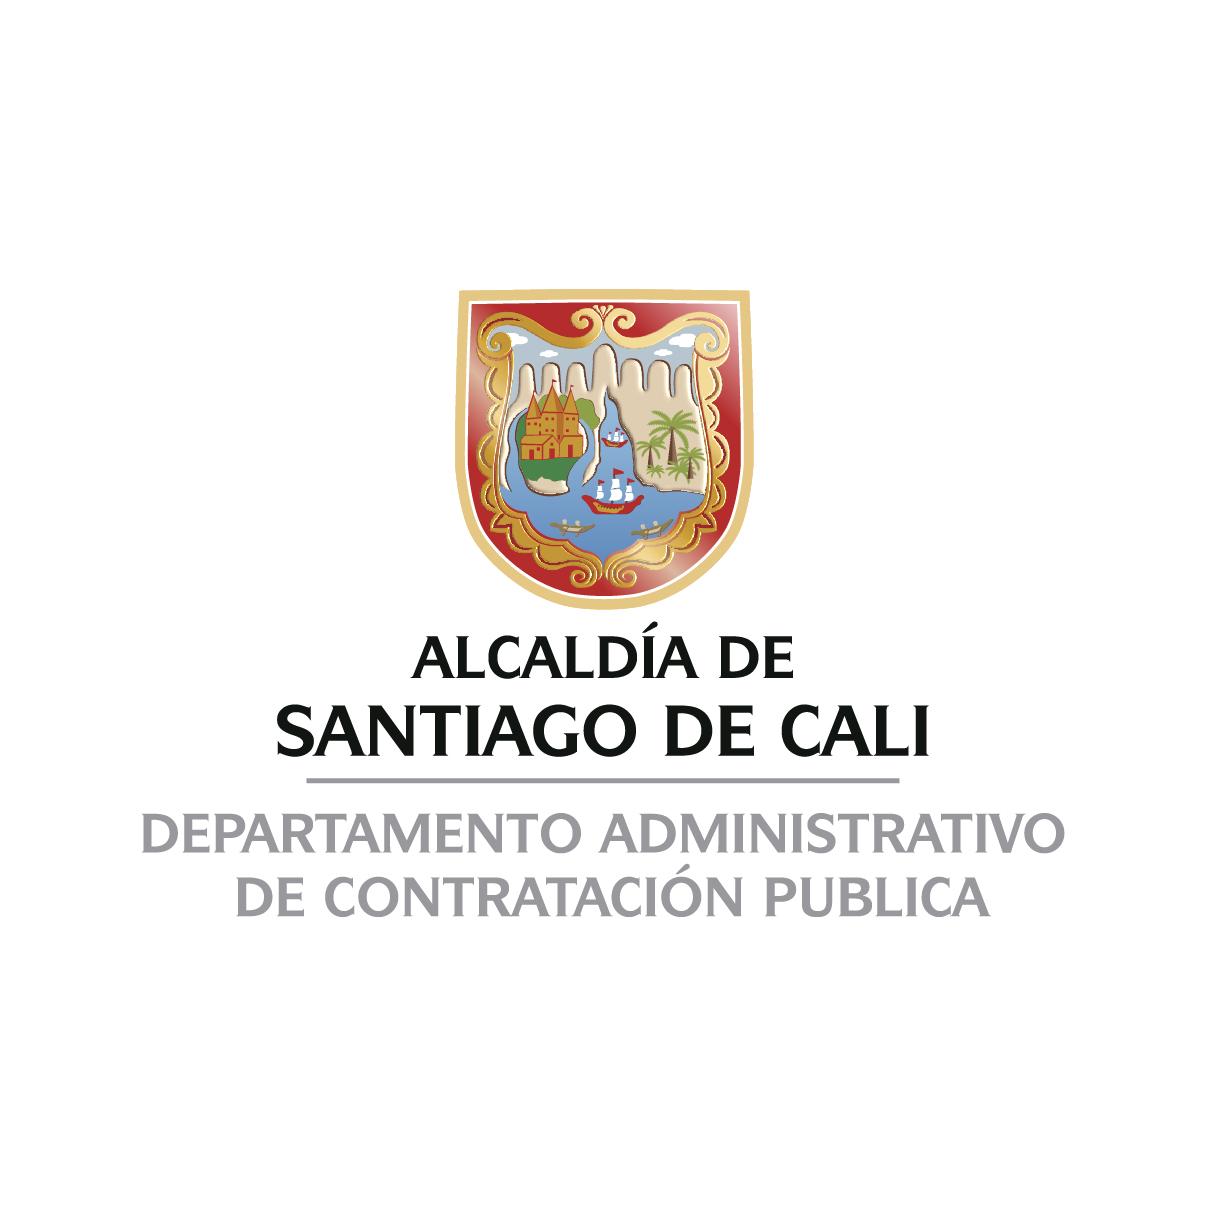 departamento-administrativo-de-contratacion-publica